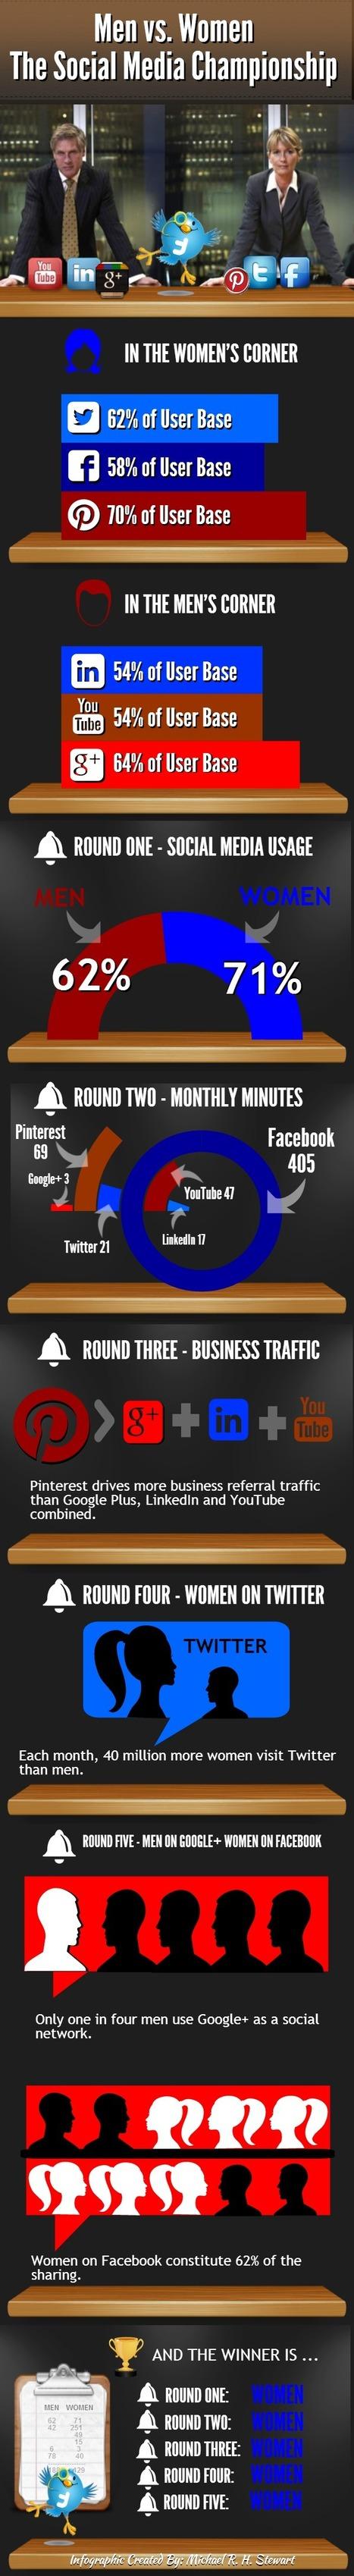 Men vs. Women – The Social Media Championship (Infographic) : Jericho Technology, Inc. | Cesar stuff | Scoop.it